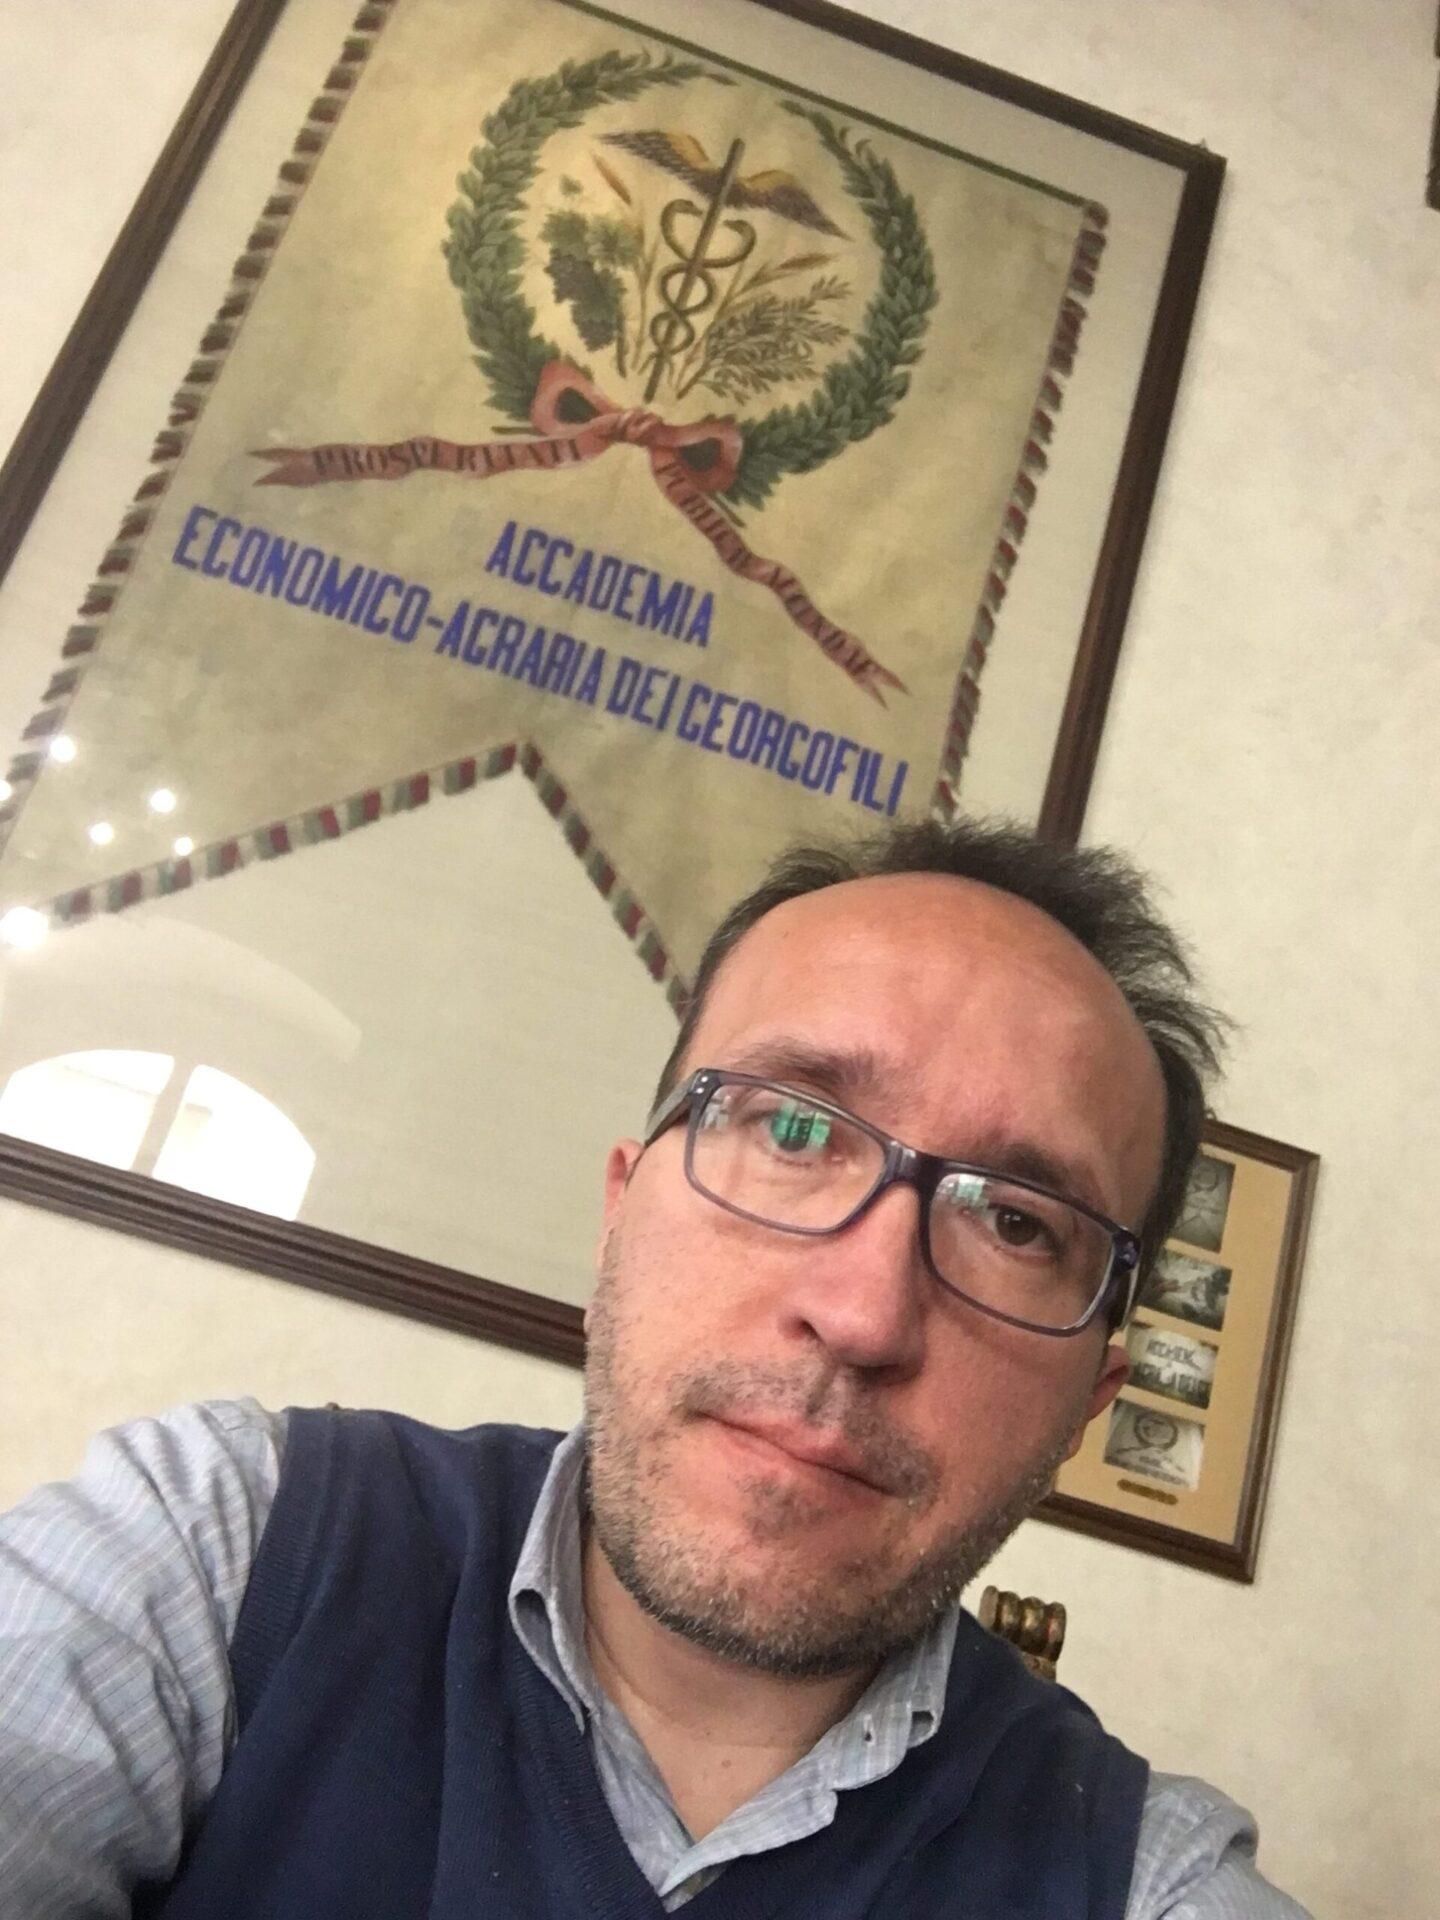 Lorenzo Benocci